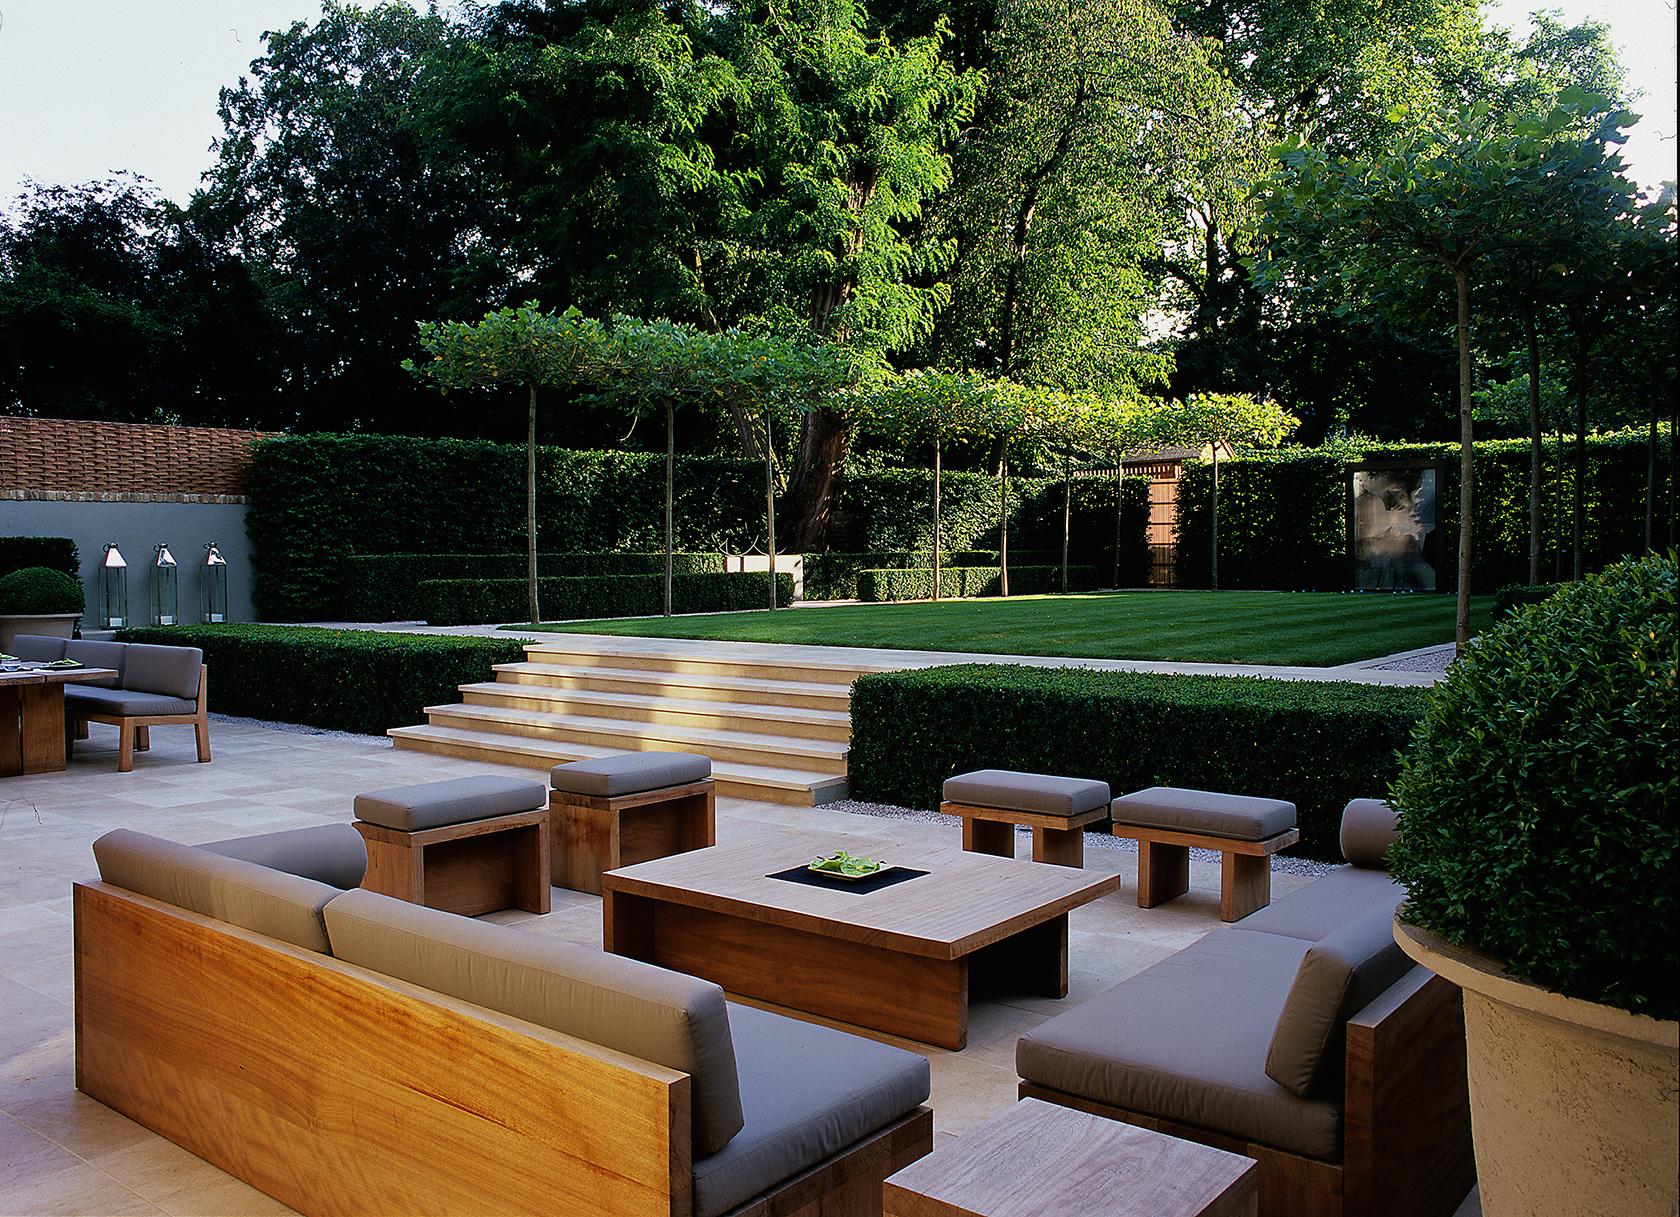 Luciano giubbilei addison road for Garden lighting design 4 homes